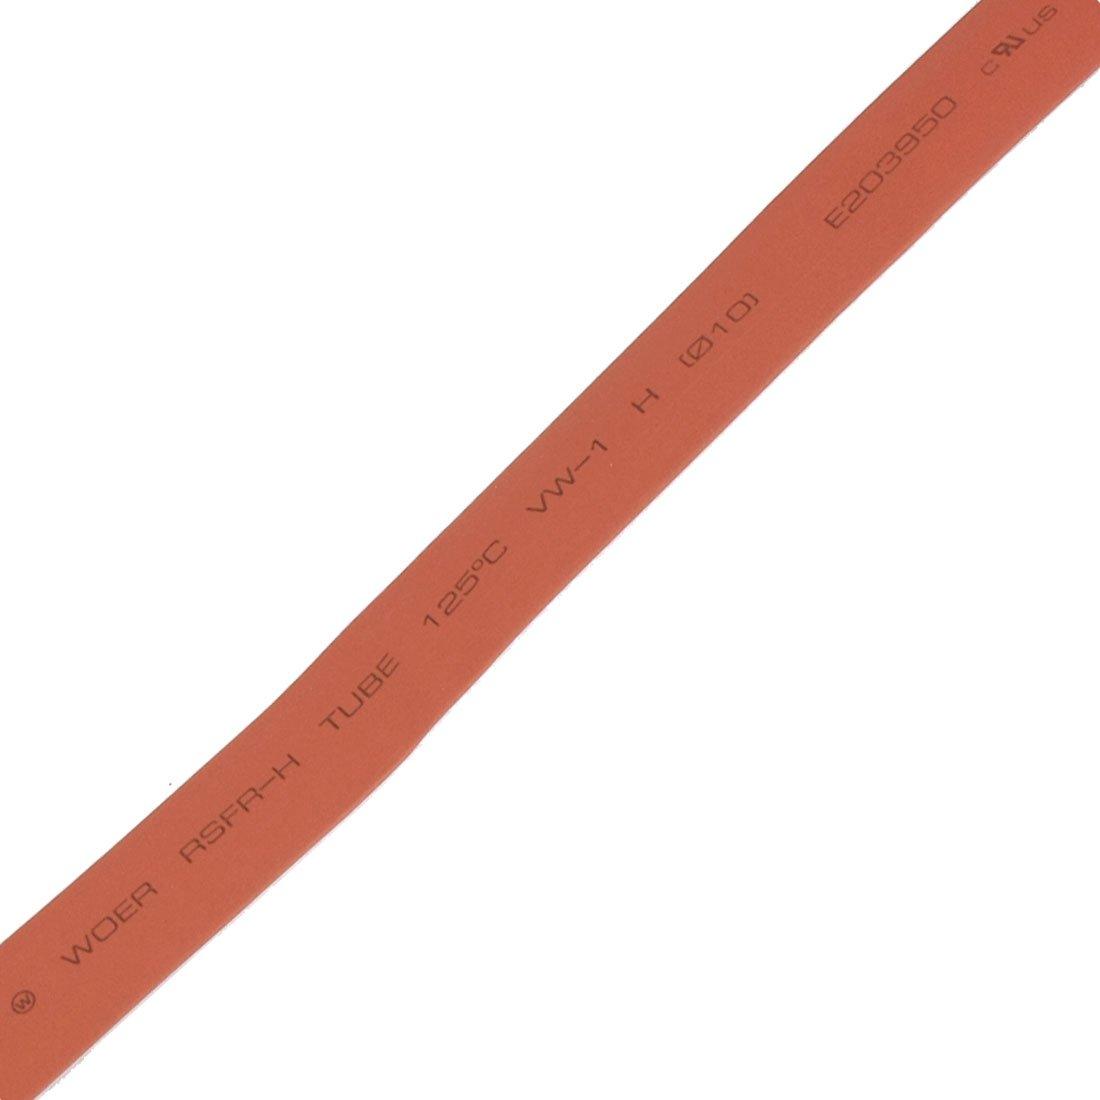 1//8 mm ID x 4 mm OD Fluorostore F015090YELSTR-100 PTFE Striped Tubing Yellow 1//8 mm ID x 4 mm OD 100/' Length Fluorotherm Polymers Inc 100 Length